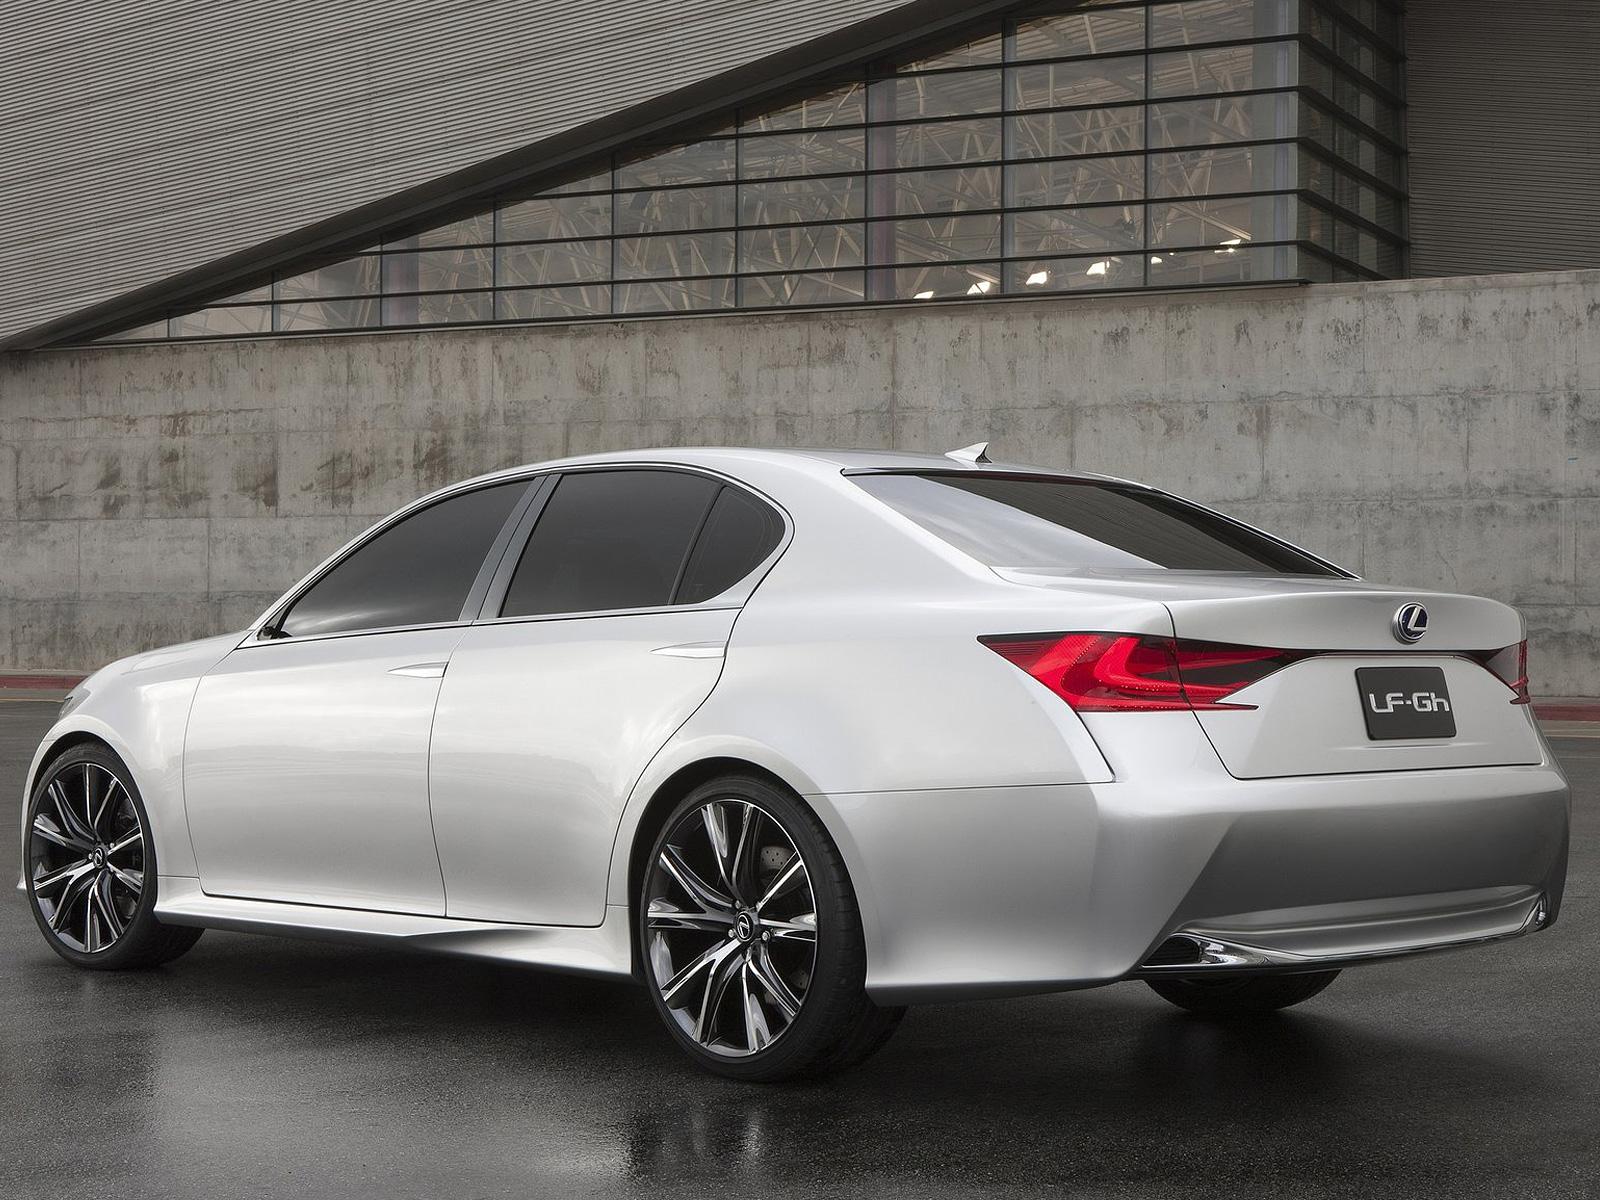 2011 Lexus Lf Gh Concept Japanese Car Photos